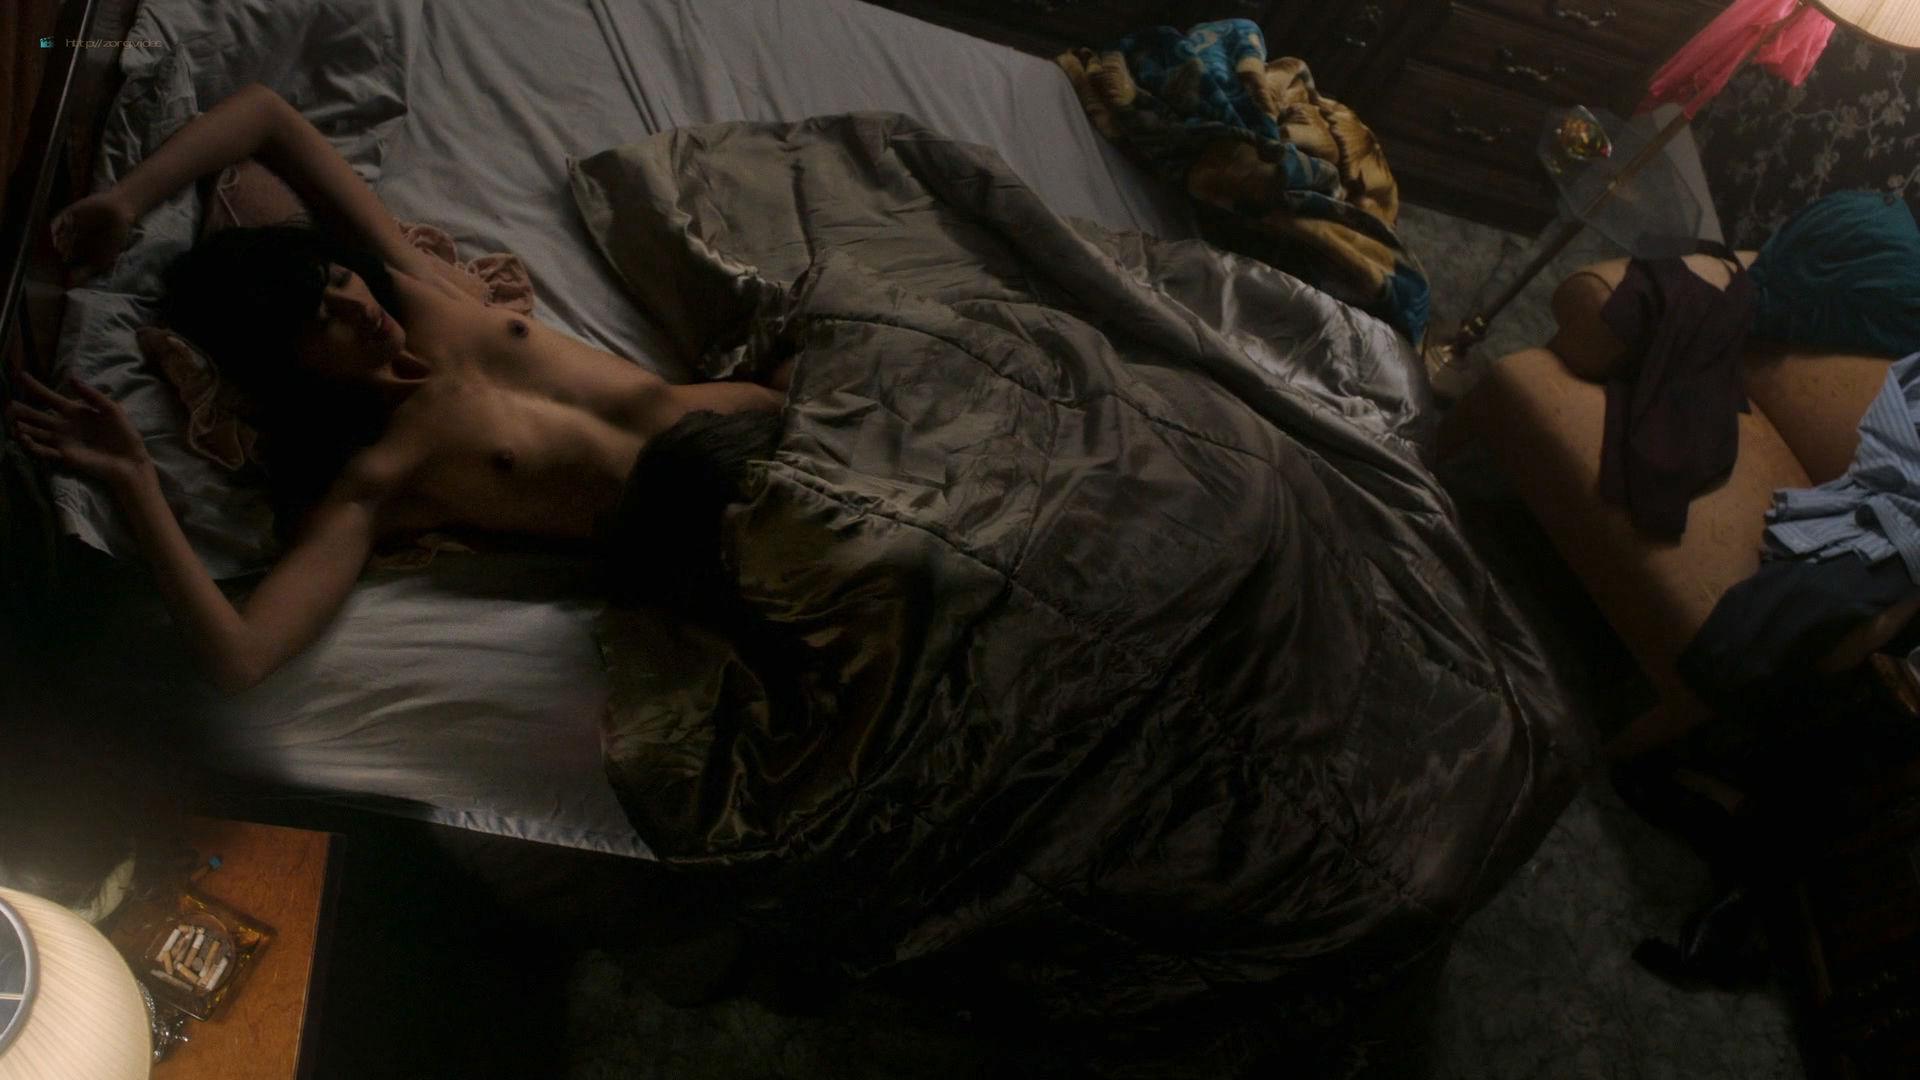 MaYaa Boateng nude topless in sex scene - City on a Hill (2019) s1e2 HD 1080p (5)